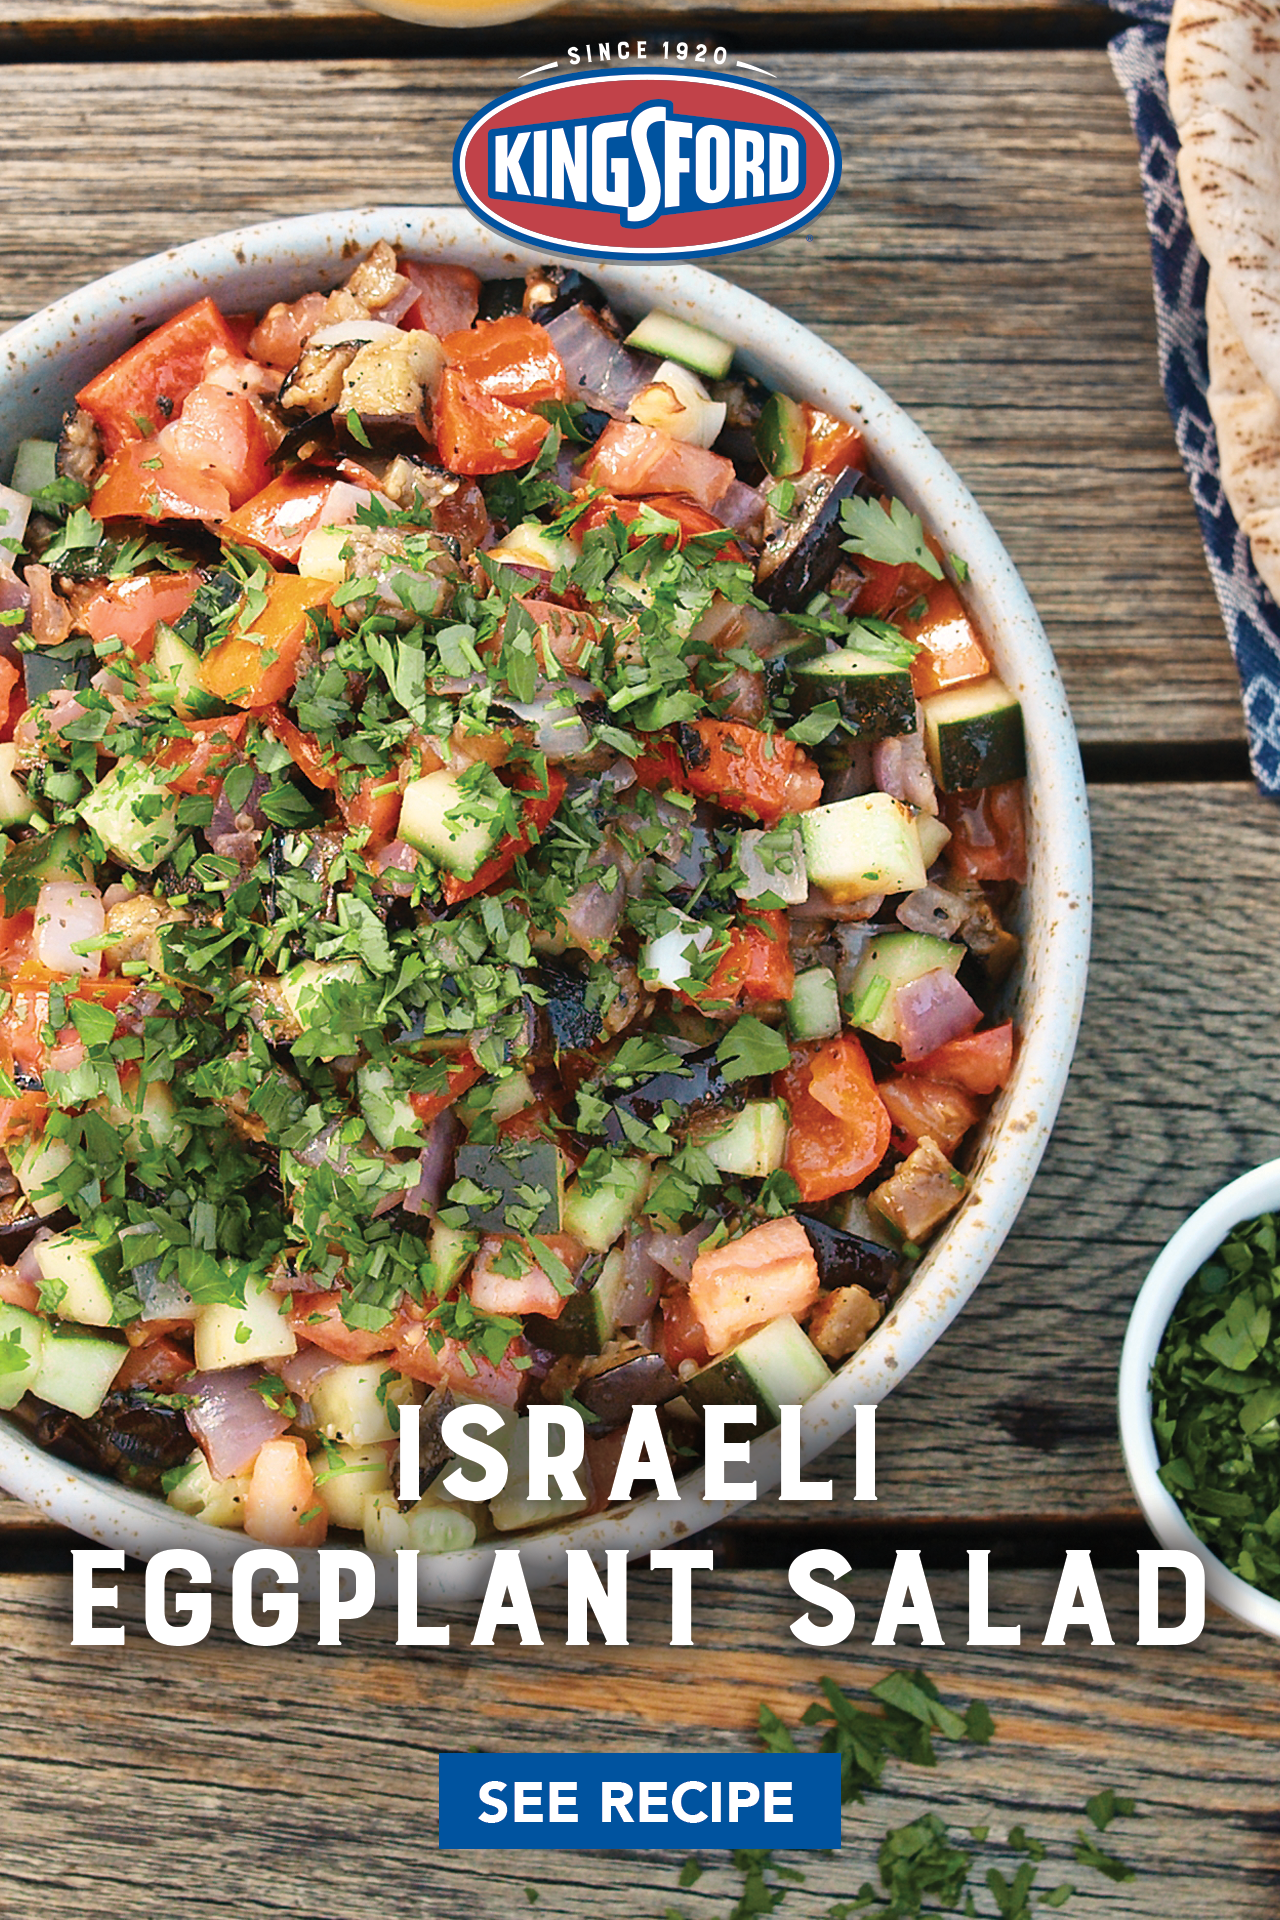 Israeli Eggplant Salad Kingsford Recipe In 2020 Health Dinner Recipes Veggie Dishes Vegetable Recipes